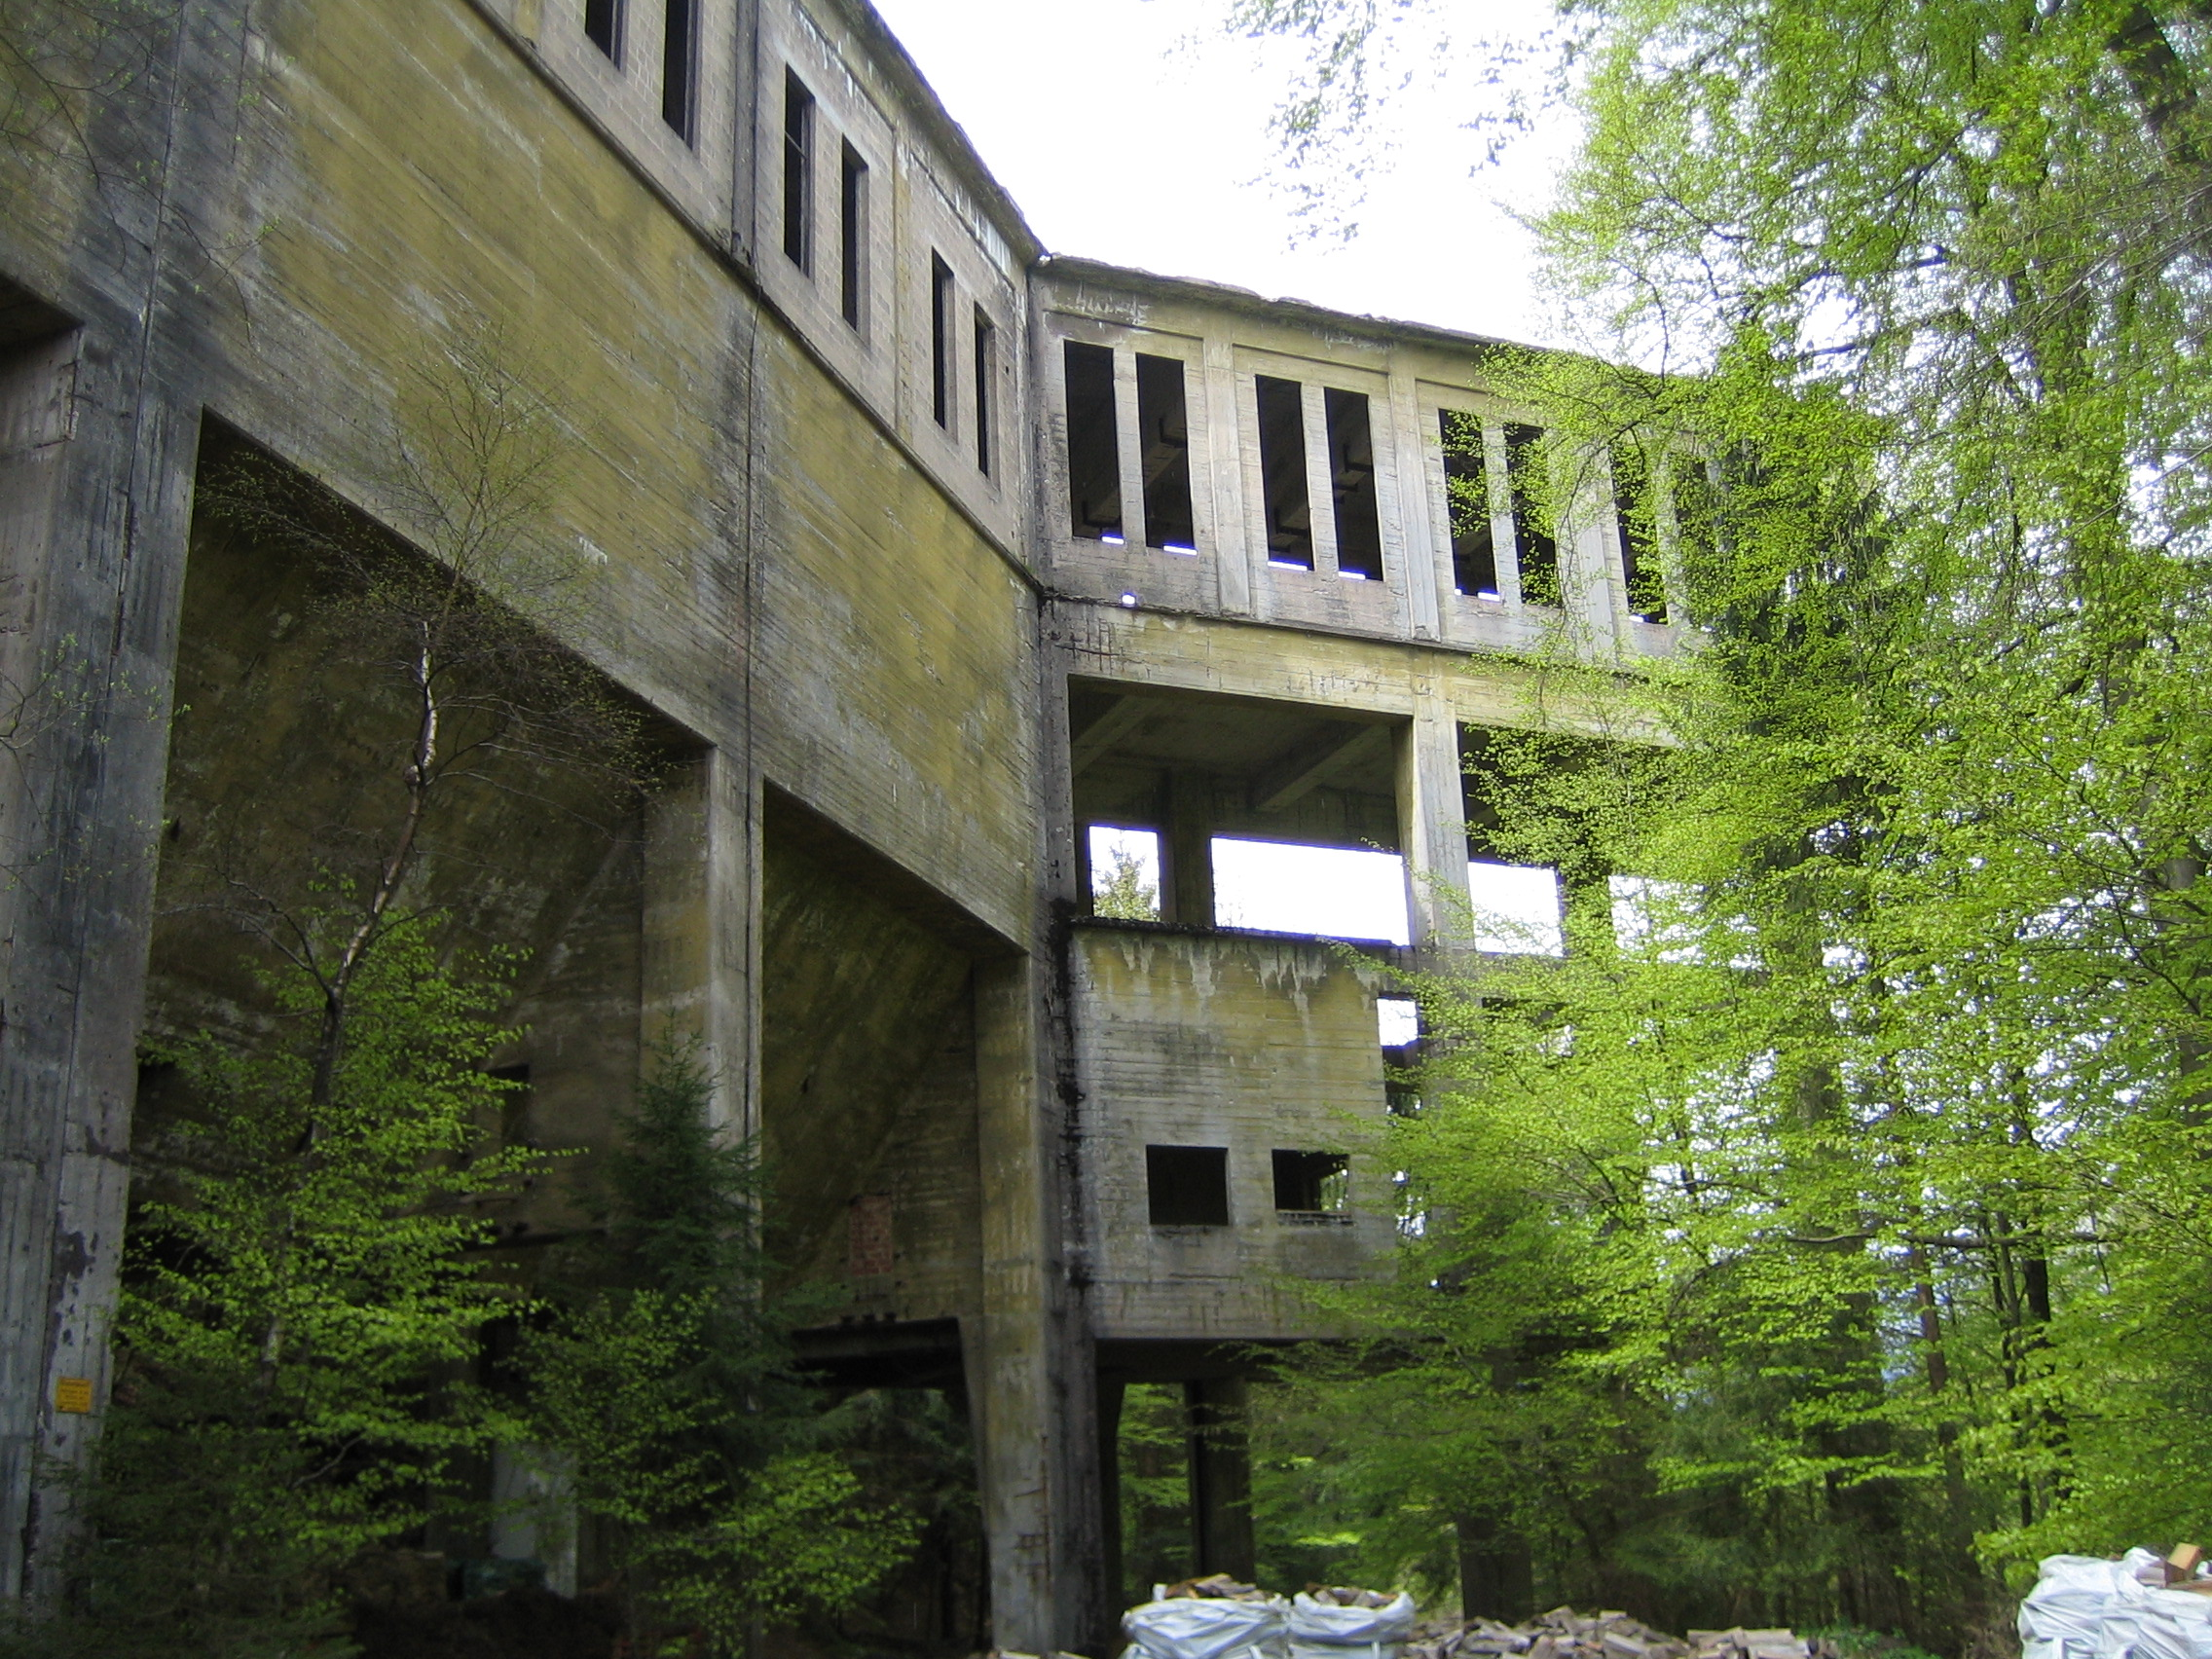 muna-hirschhagen-kohlebunker